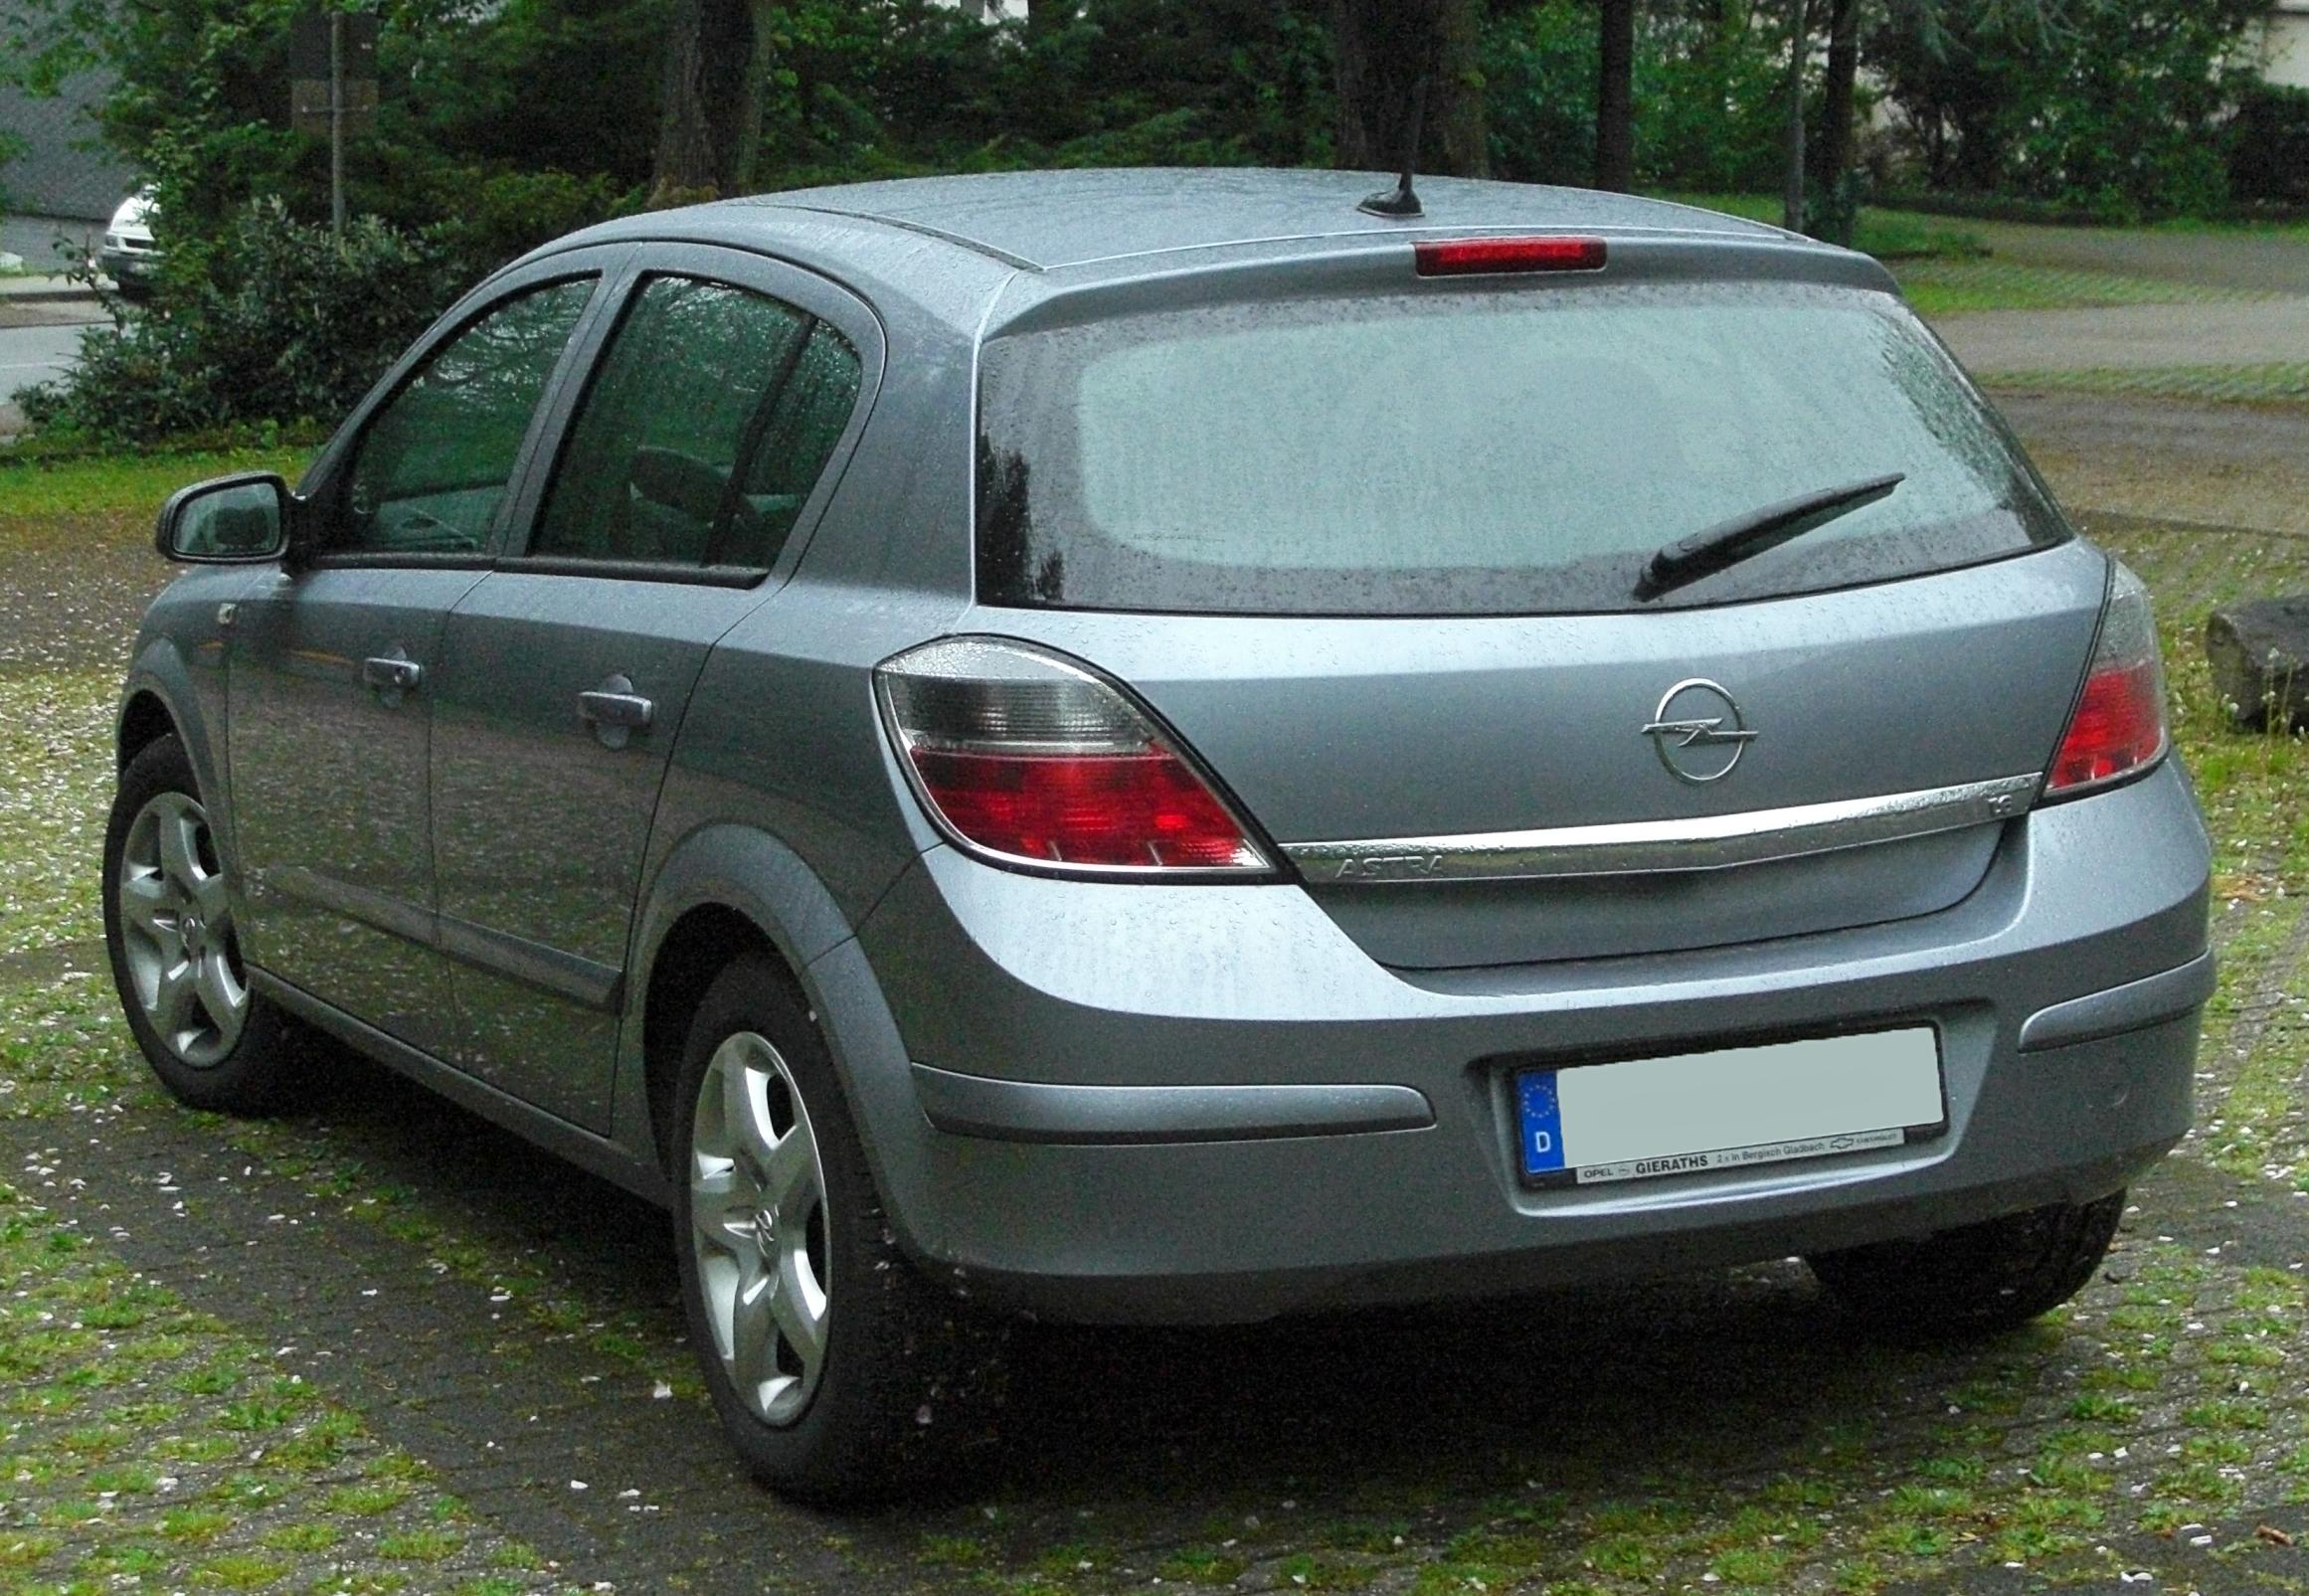 File Opel Astra H 1 6 Facelift Rear 20100512 Jpg Wikimedia Commons